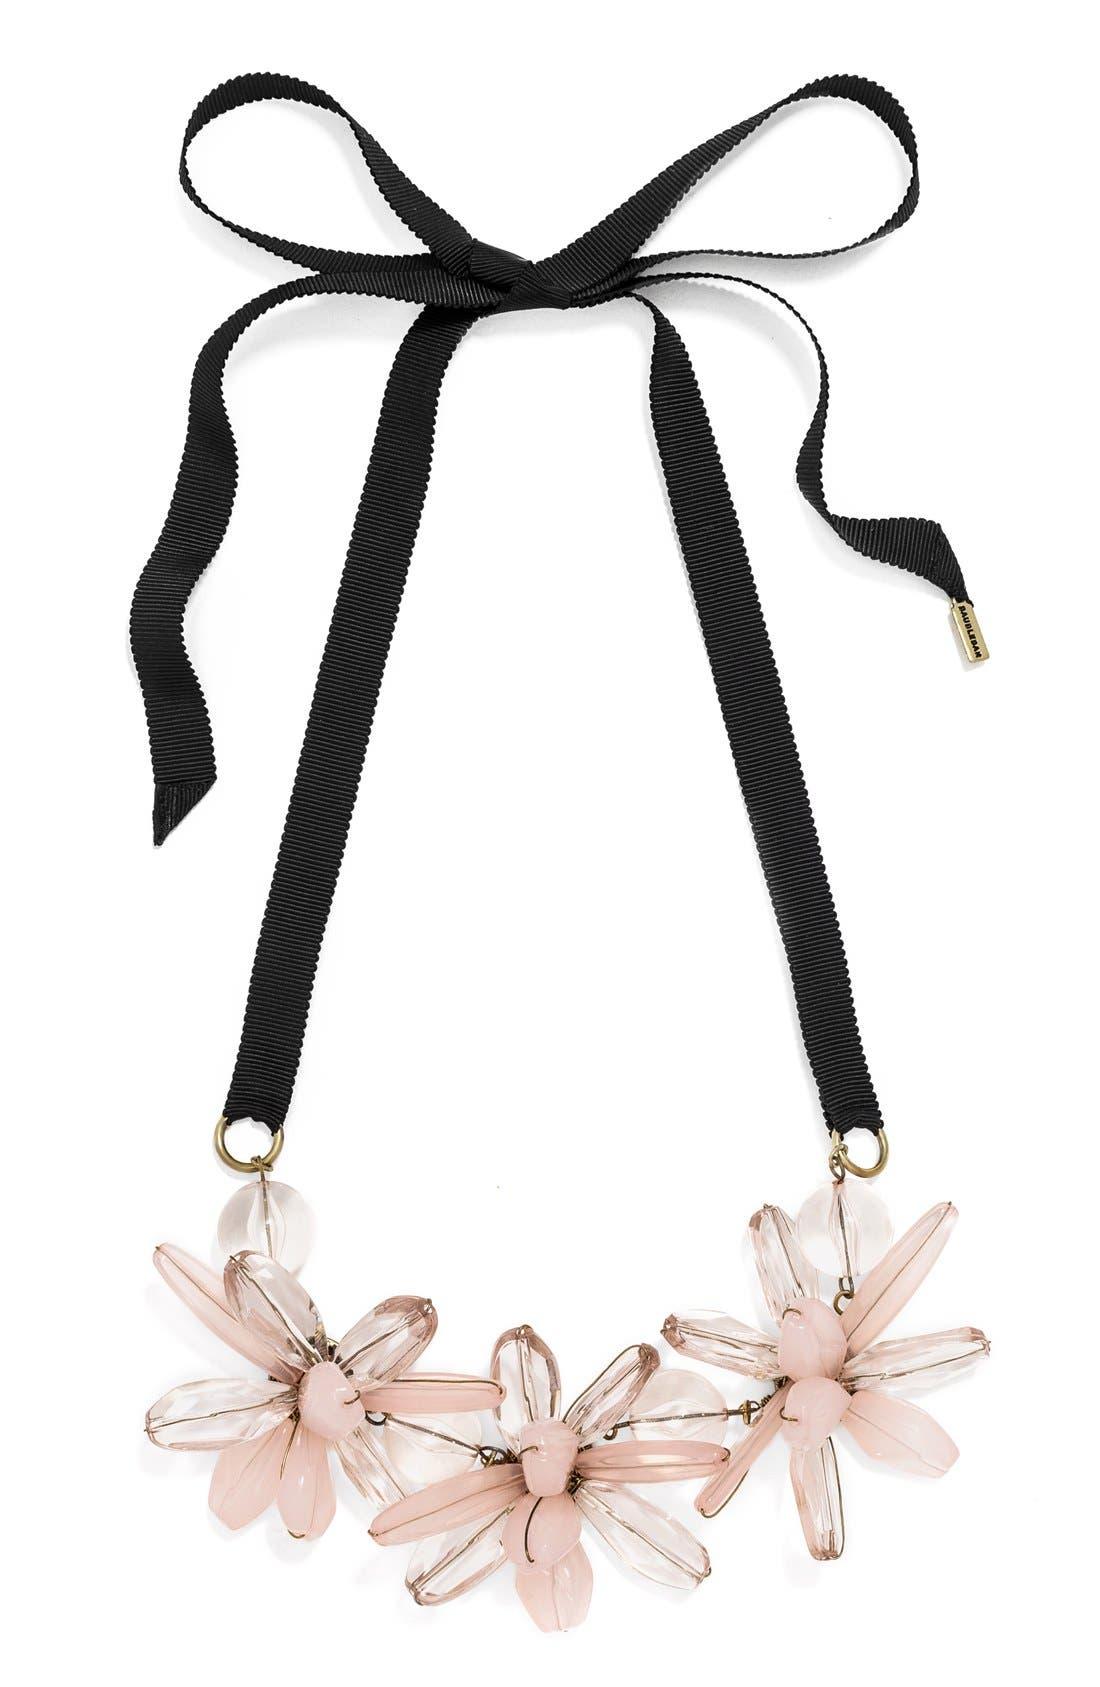 Main Image - BaubleBar 'Plumeria' Collar Necklace